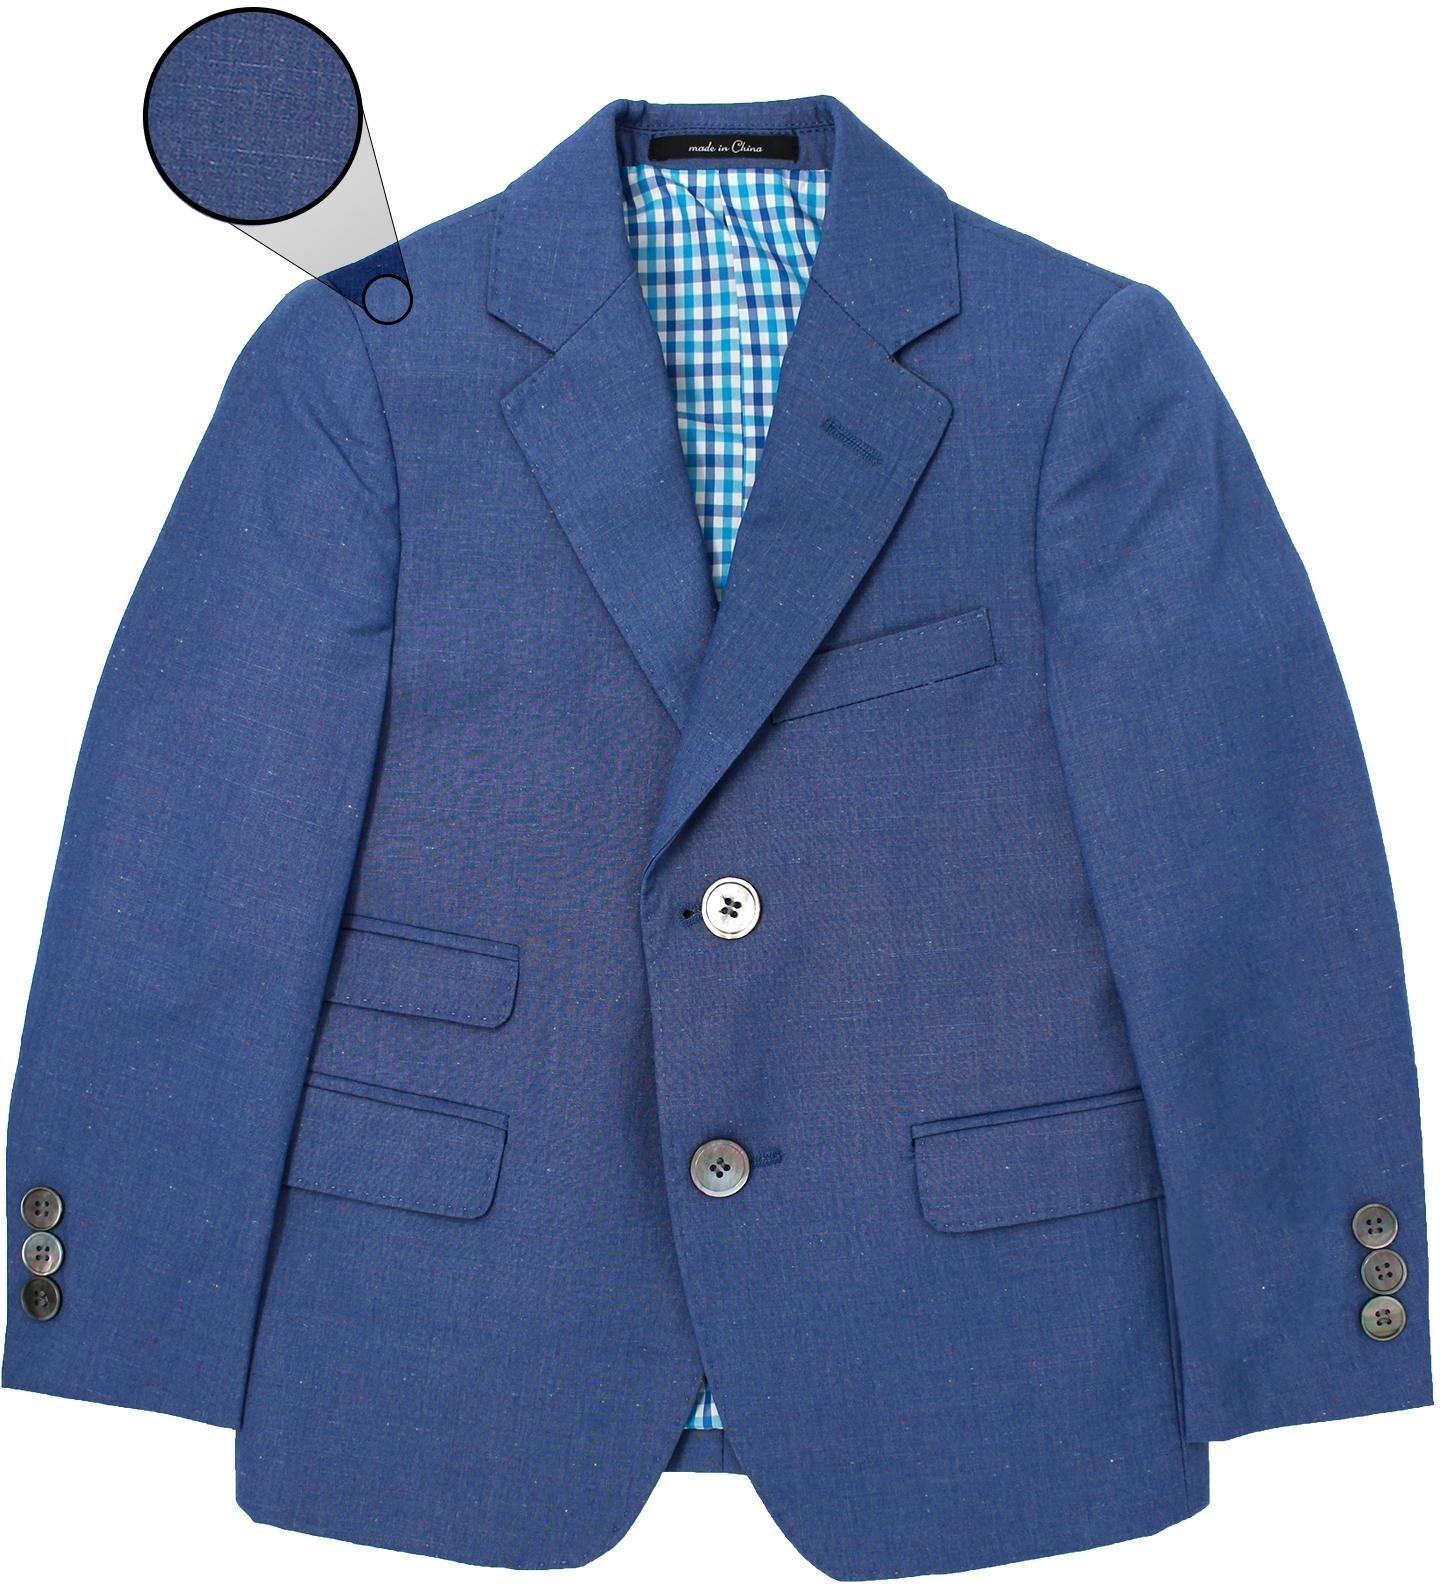 T.O. Collection Boys Blue Slim Fit Blazer - 1622-22 - Blue, 4 Slim